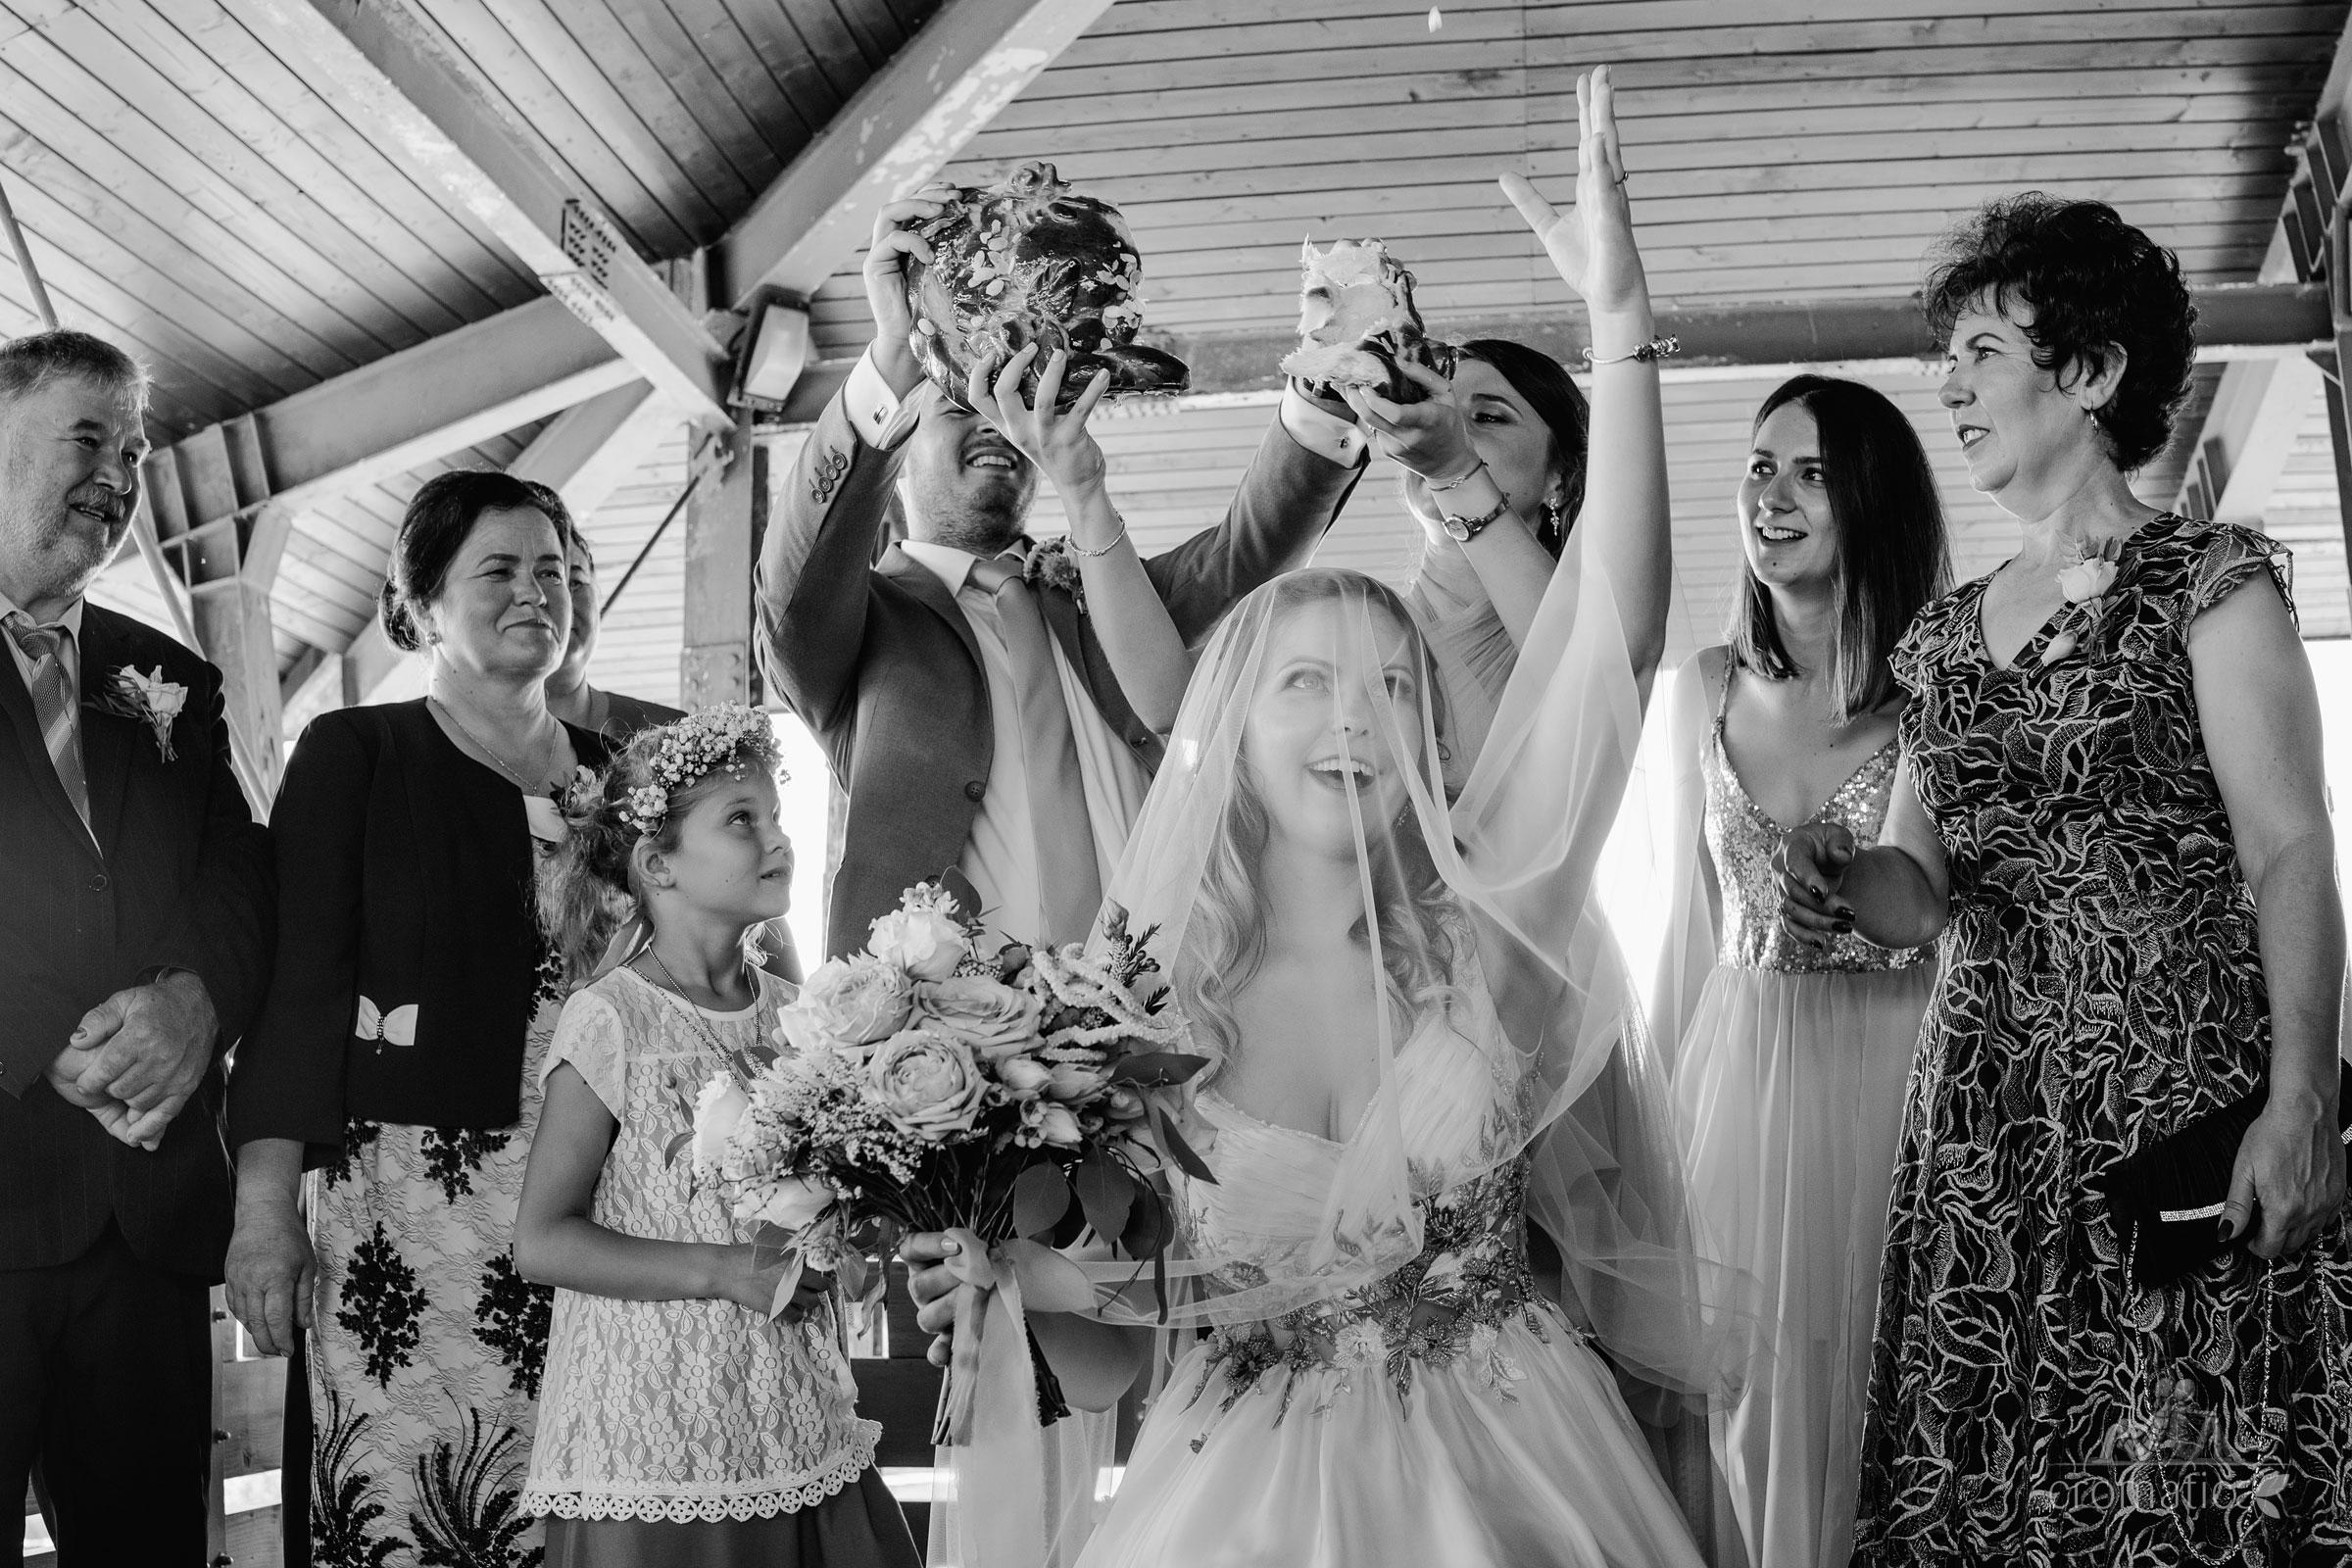 alexandra george fotografii nunta casa vlasia 047